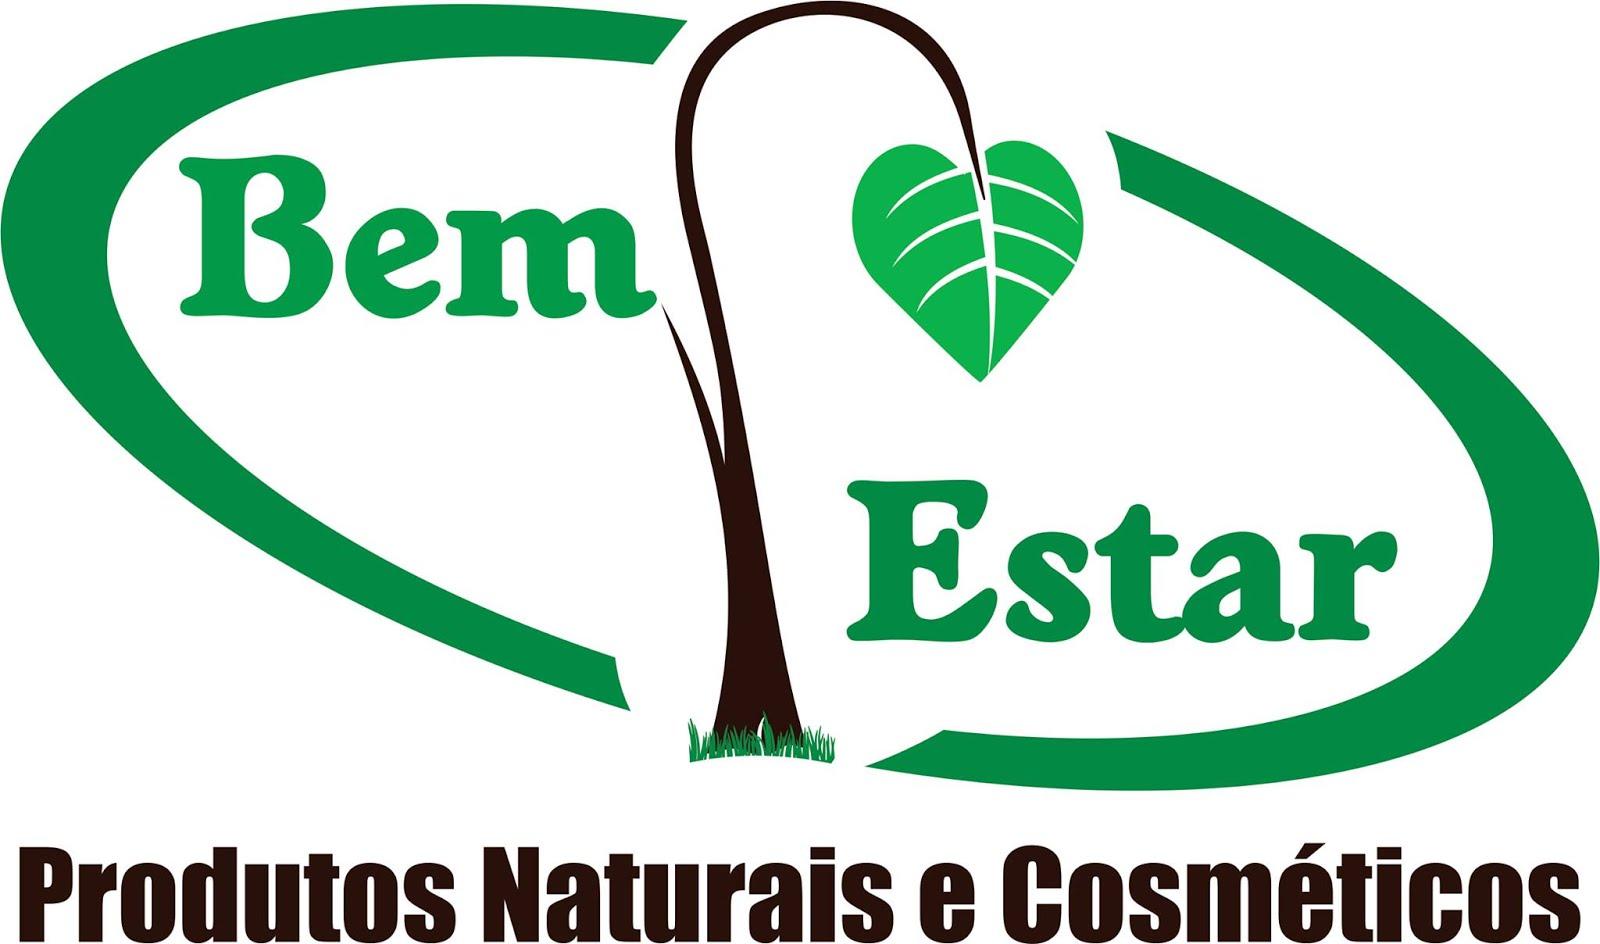 Produtos Naturais e Cosméticos